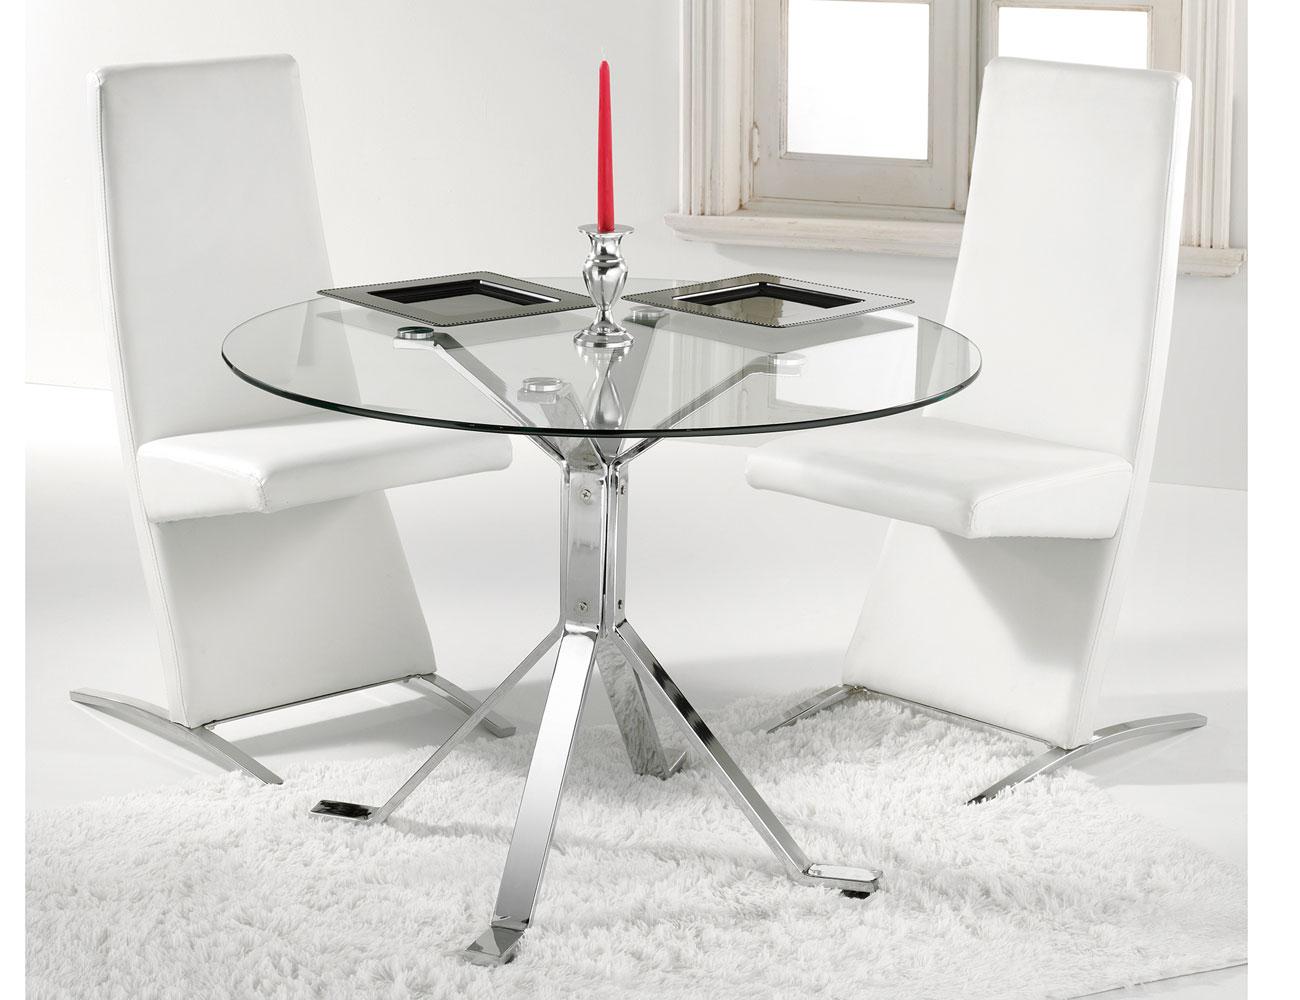 22 genial mesa comedor cristal redonda fotos mesas de - Mesa comedor cristal redonda ...